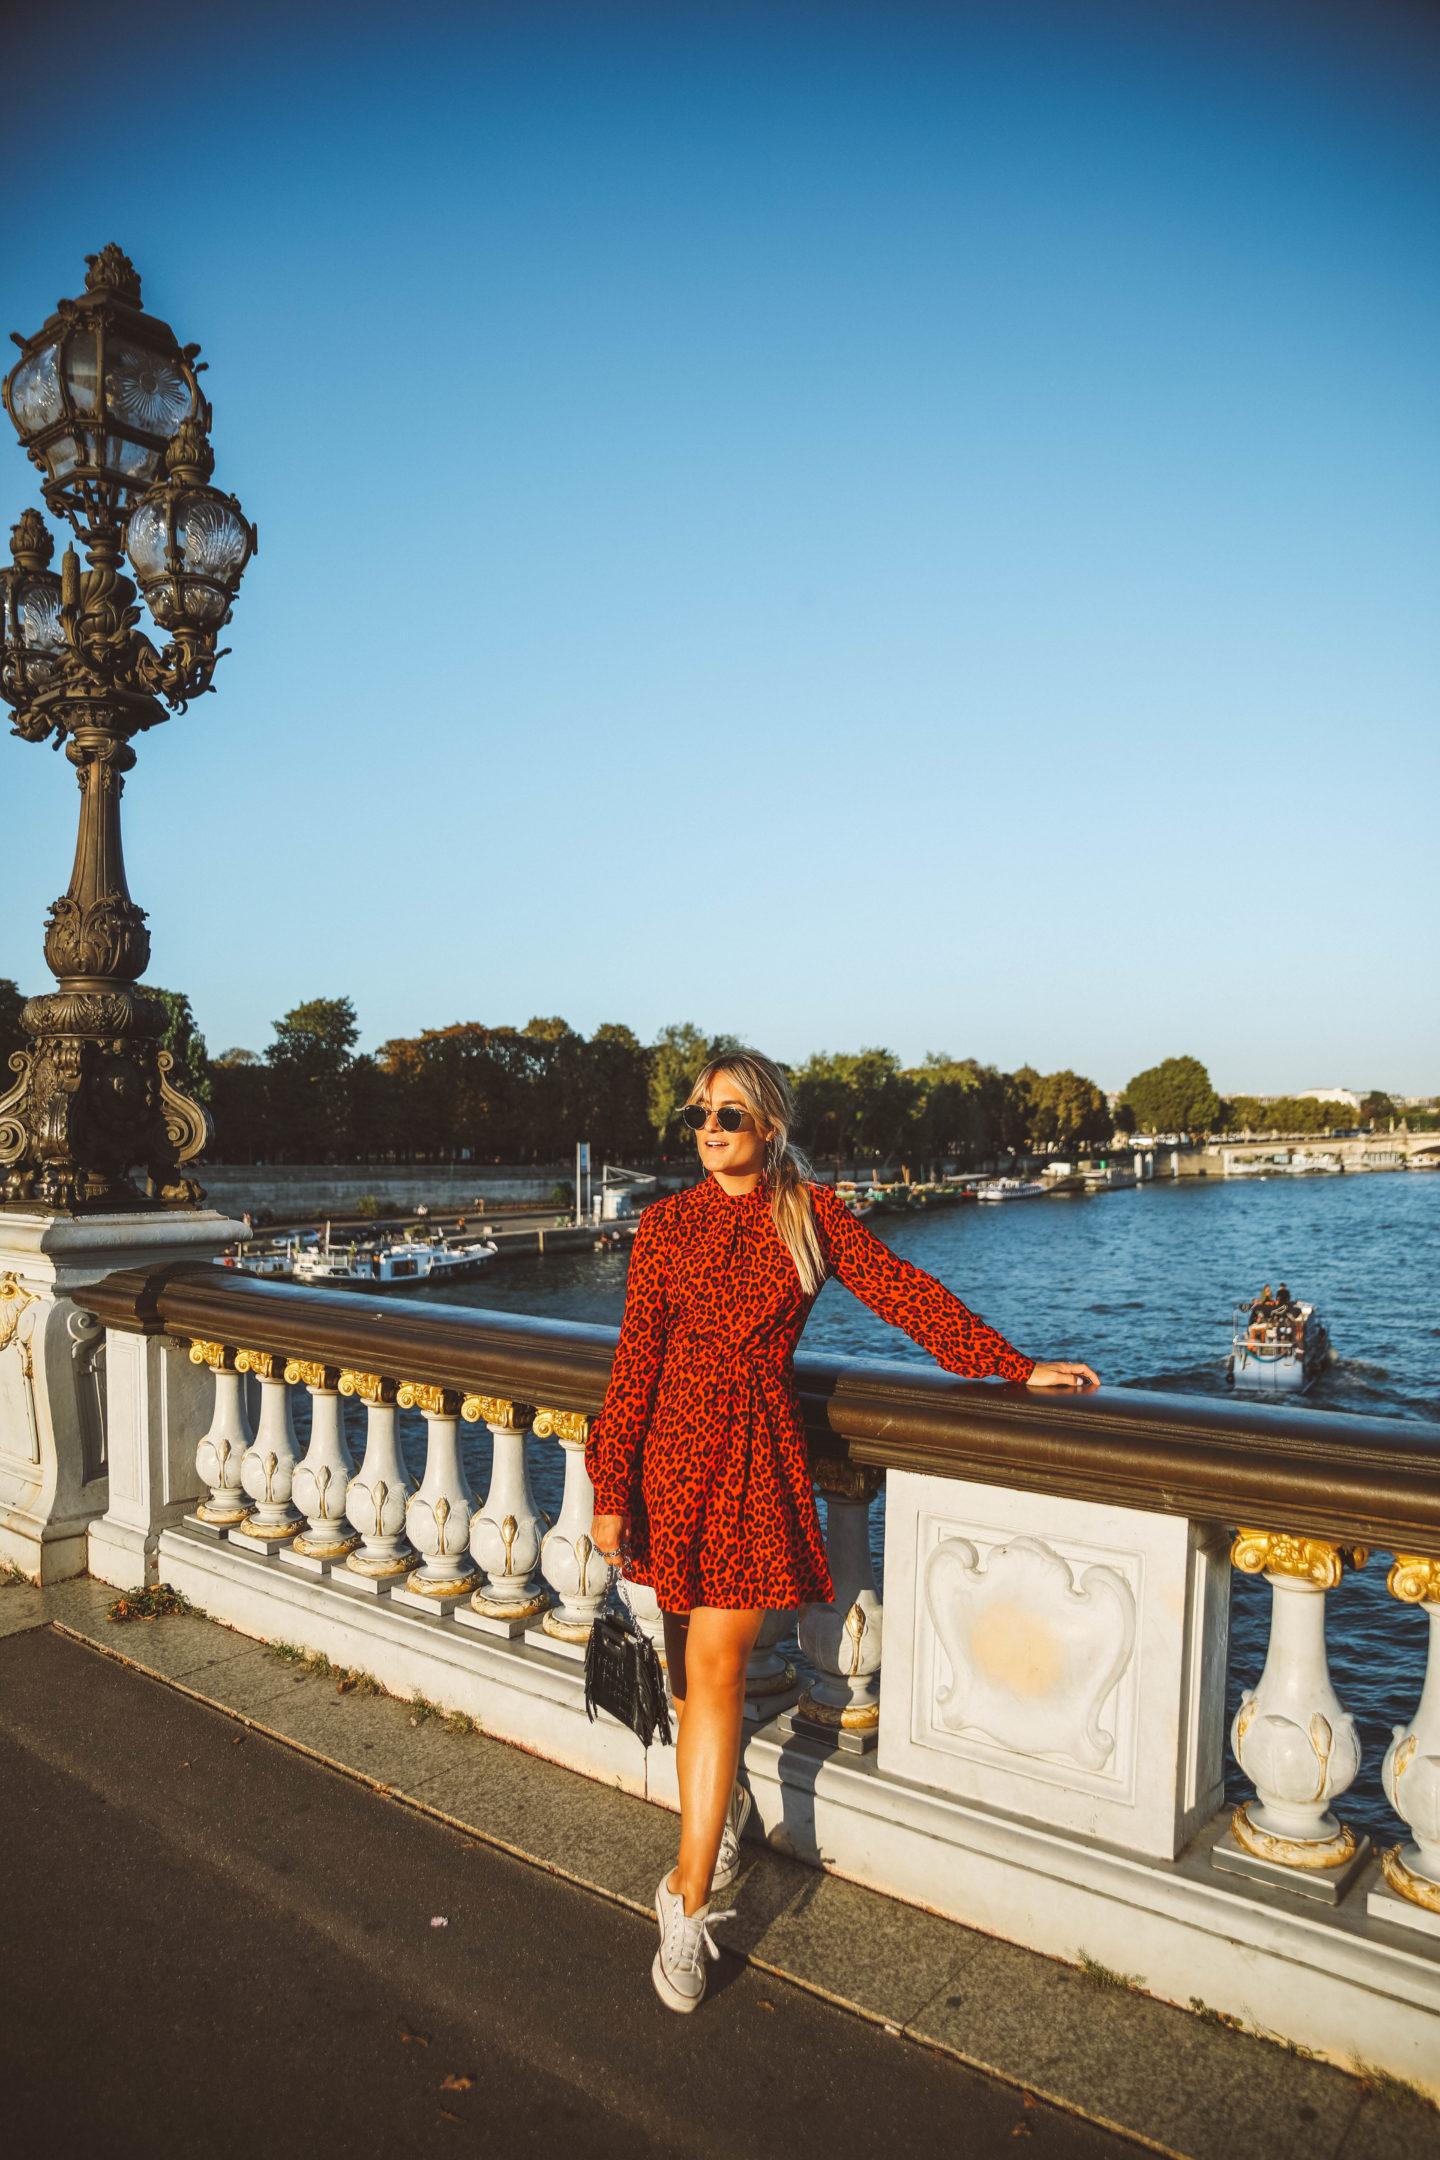 Robe Idano Paris - Blondie Baby blog mode Paris et voyages